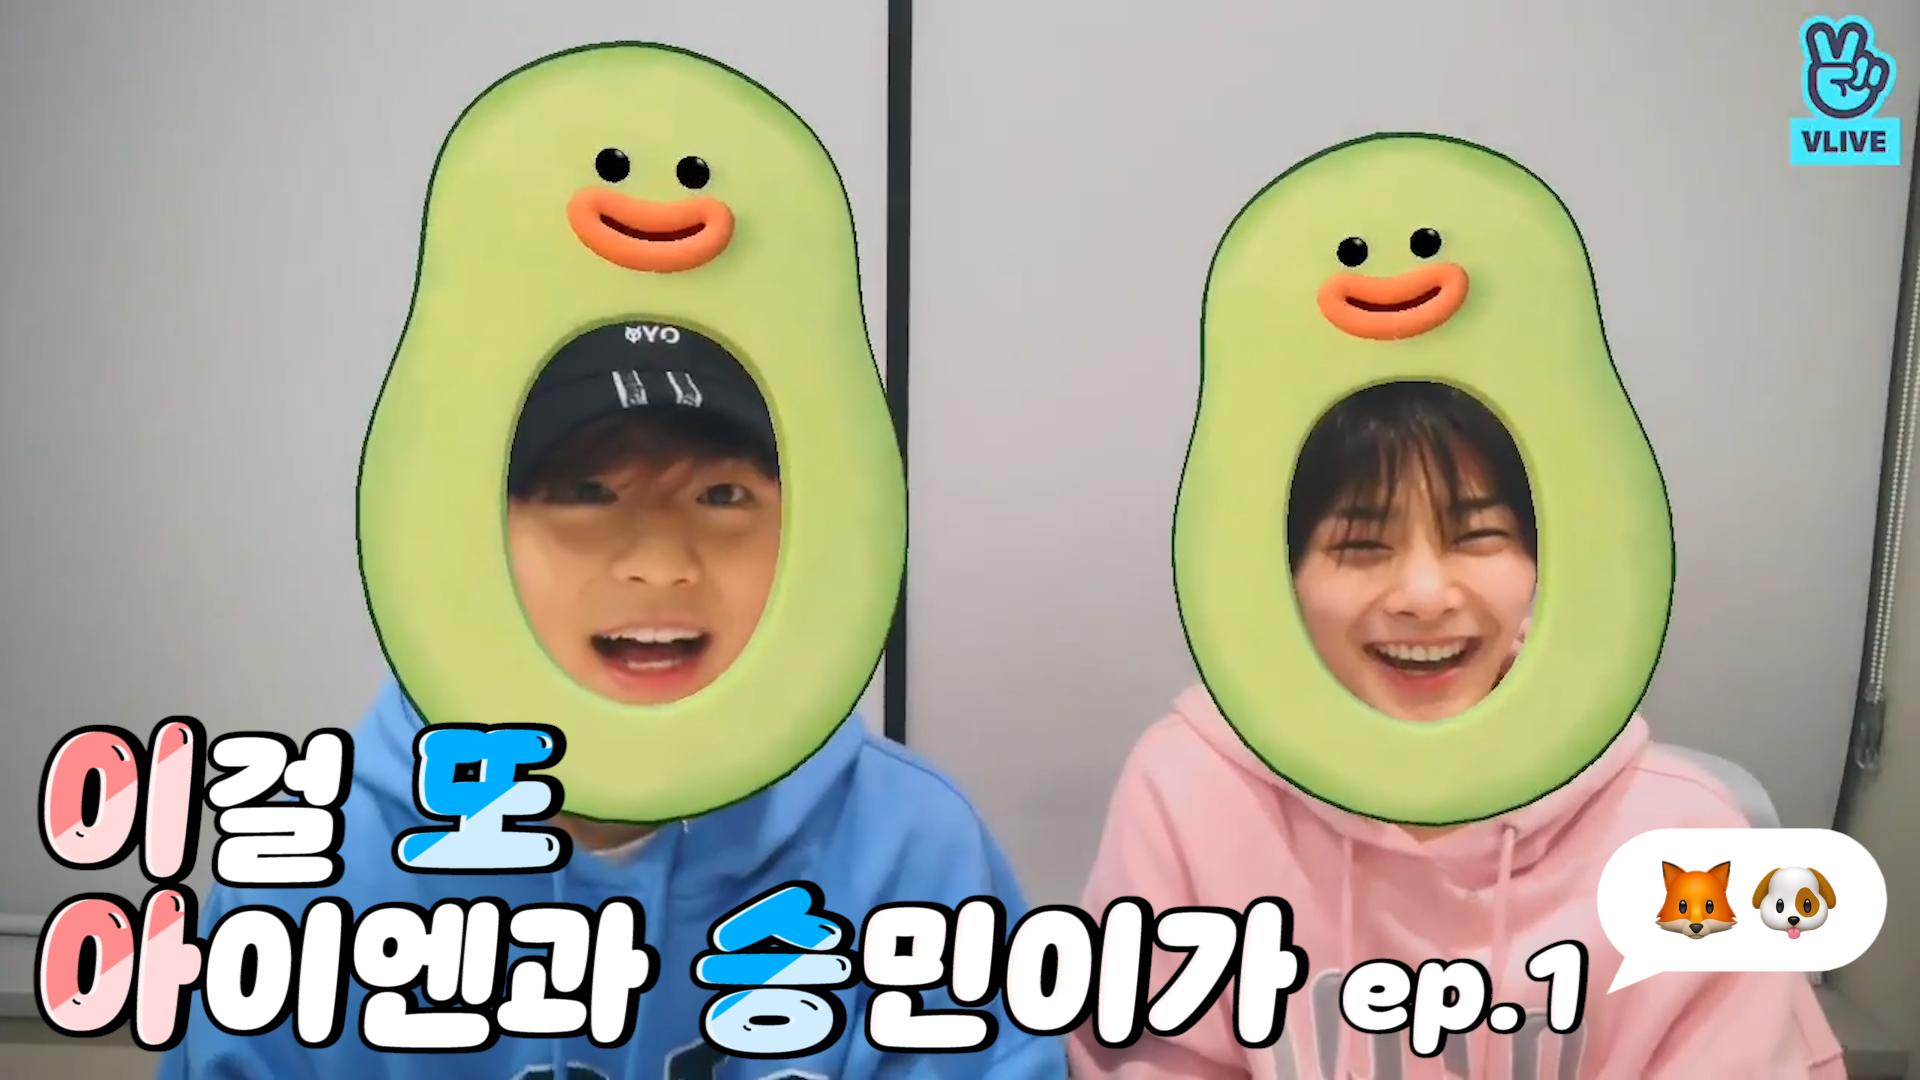 [Stray Kids] 초딩들 맞잖아요~ (초)단위로 머리가 (딩)하게 귀여워🦊🐶 (SEUNGMIN&I.N playing with a hoodie)